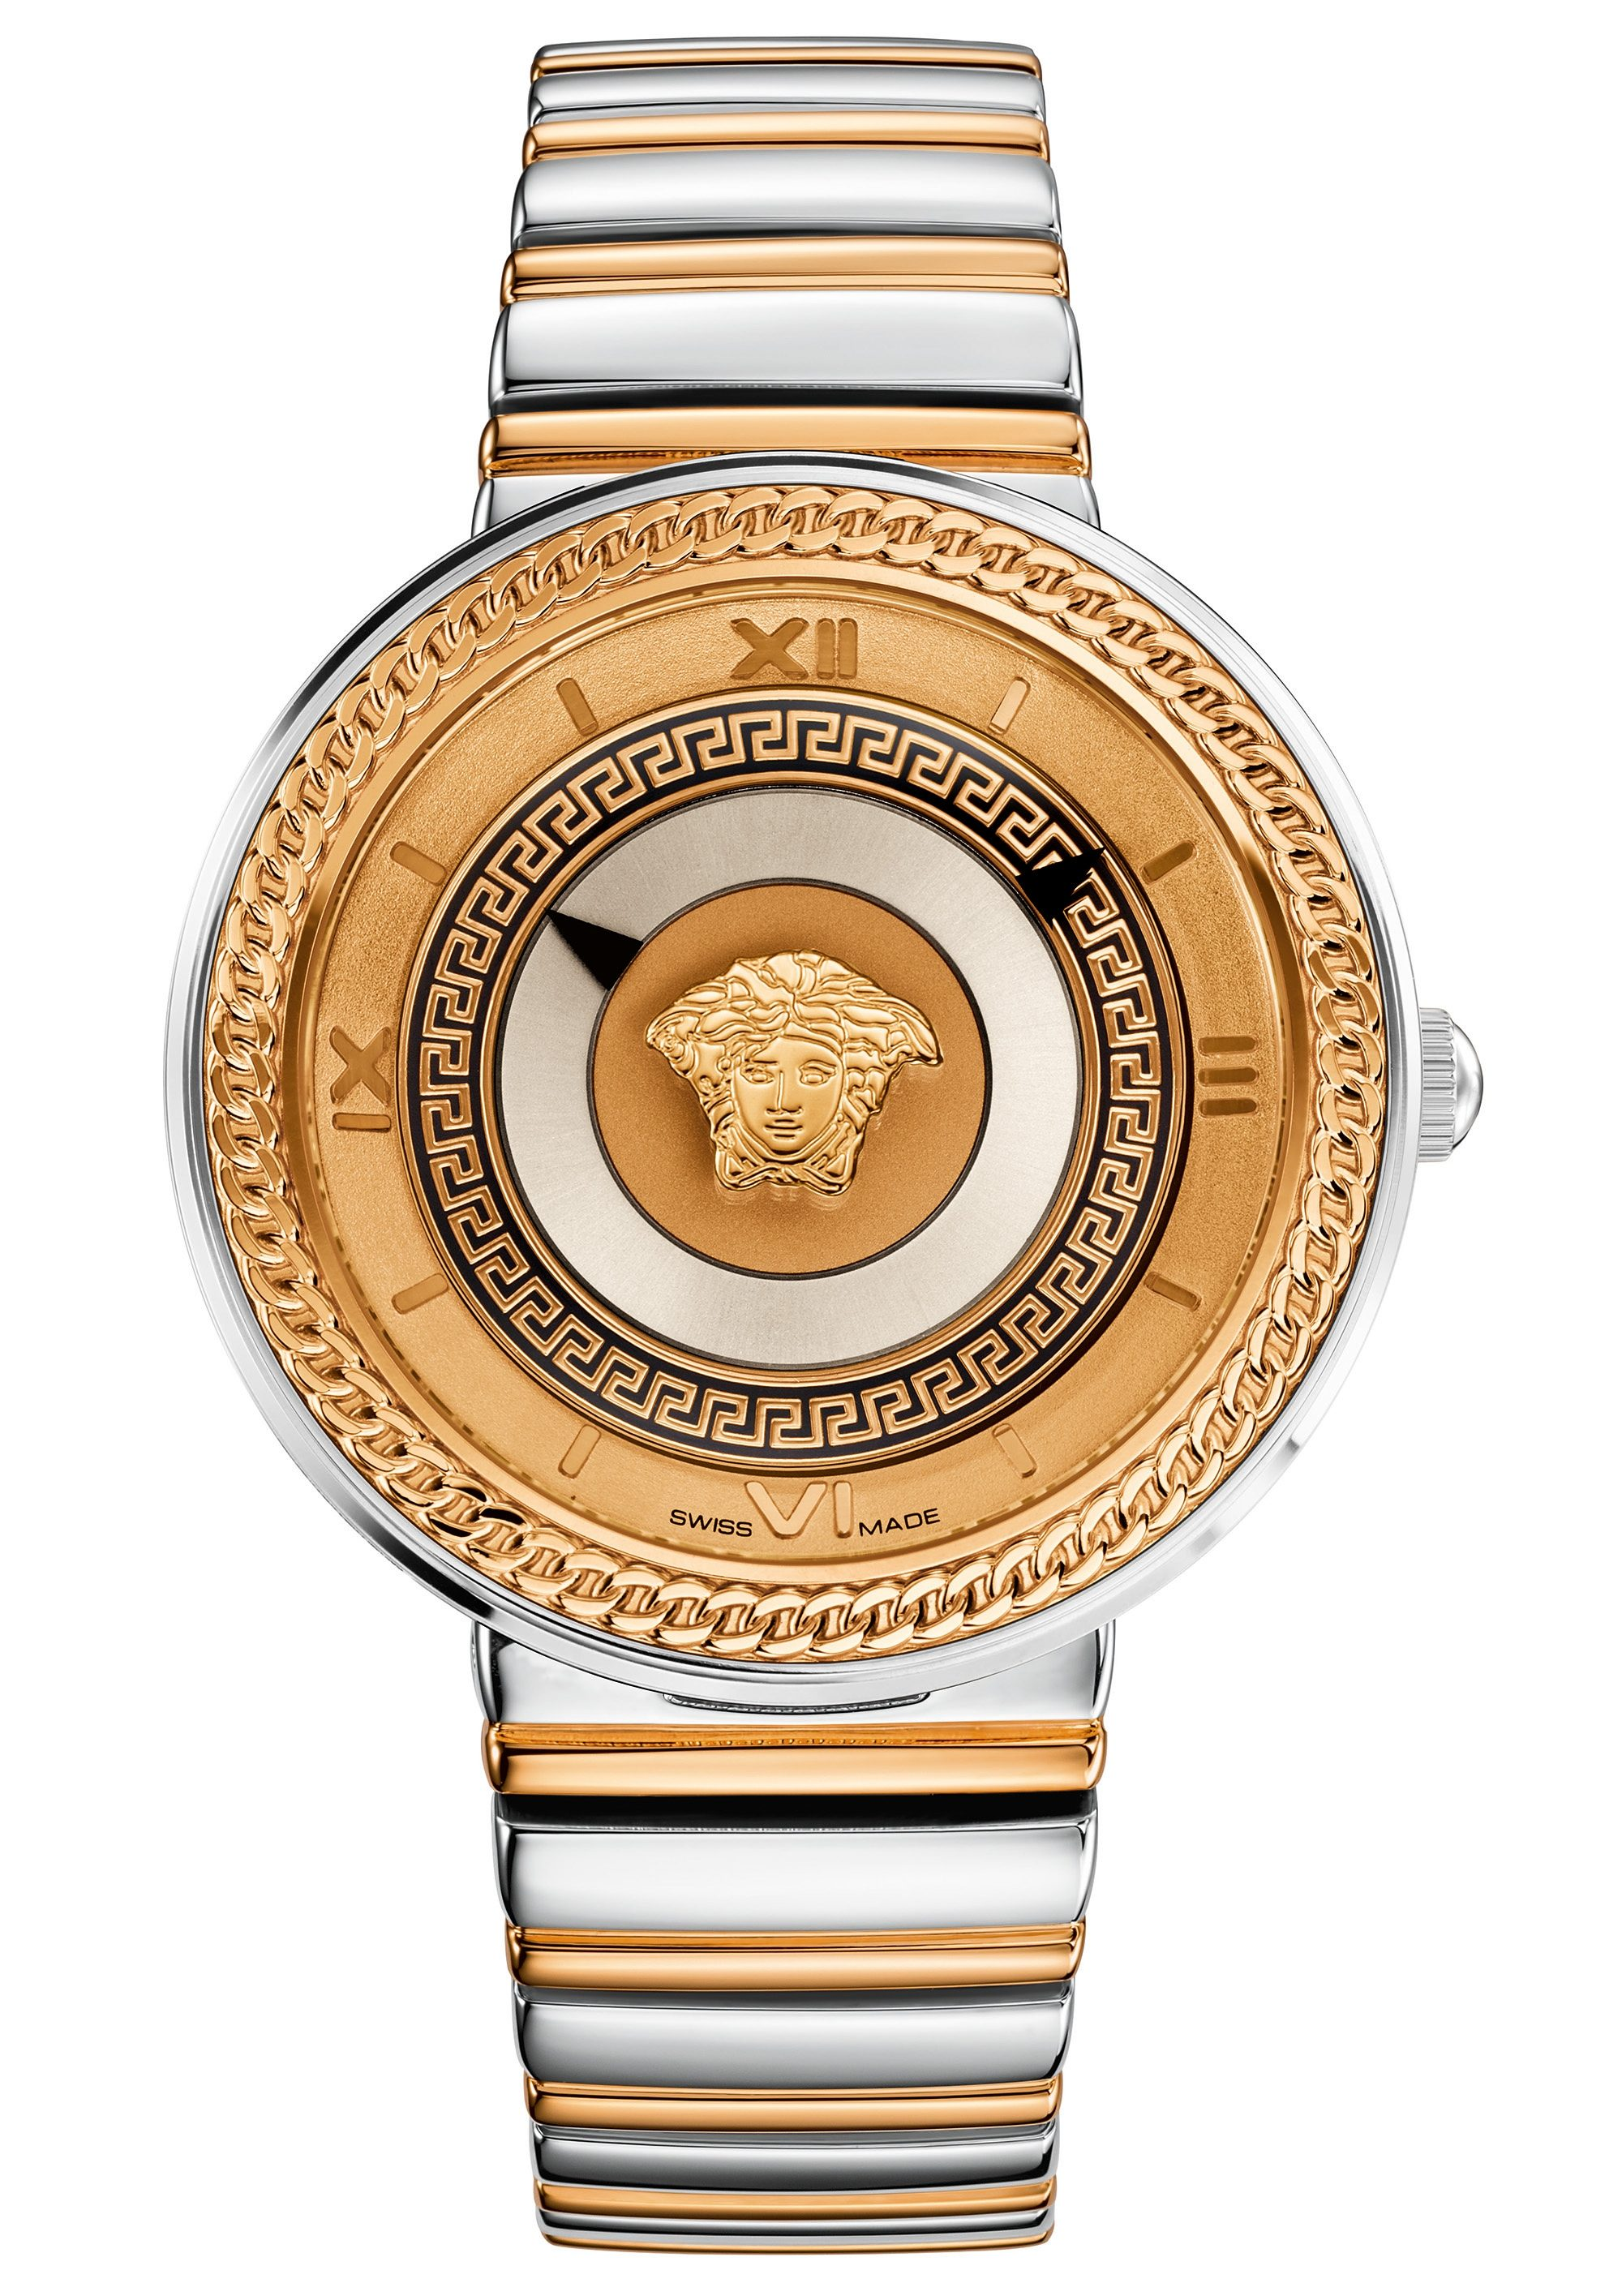 Versace Armbanduhr, »V-METAL, VLC080014«